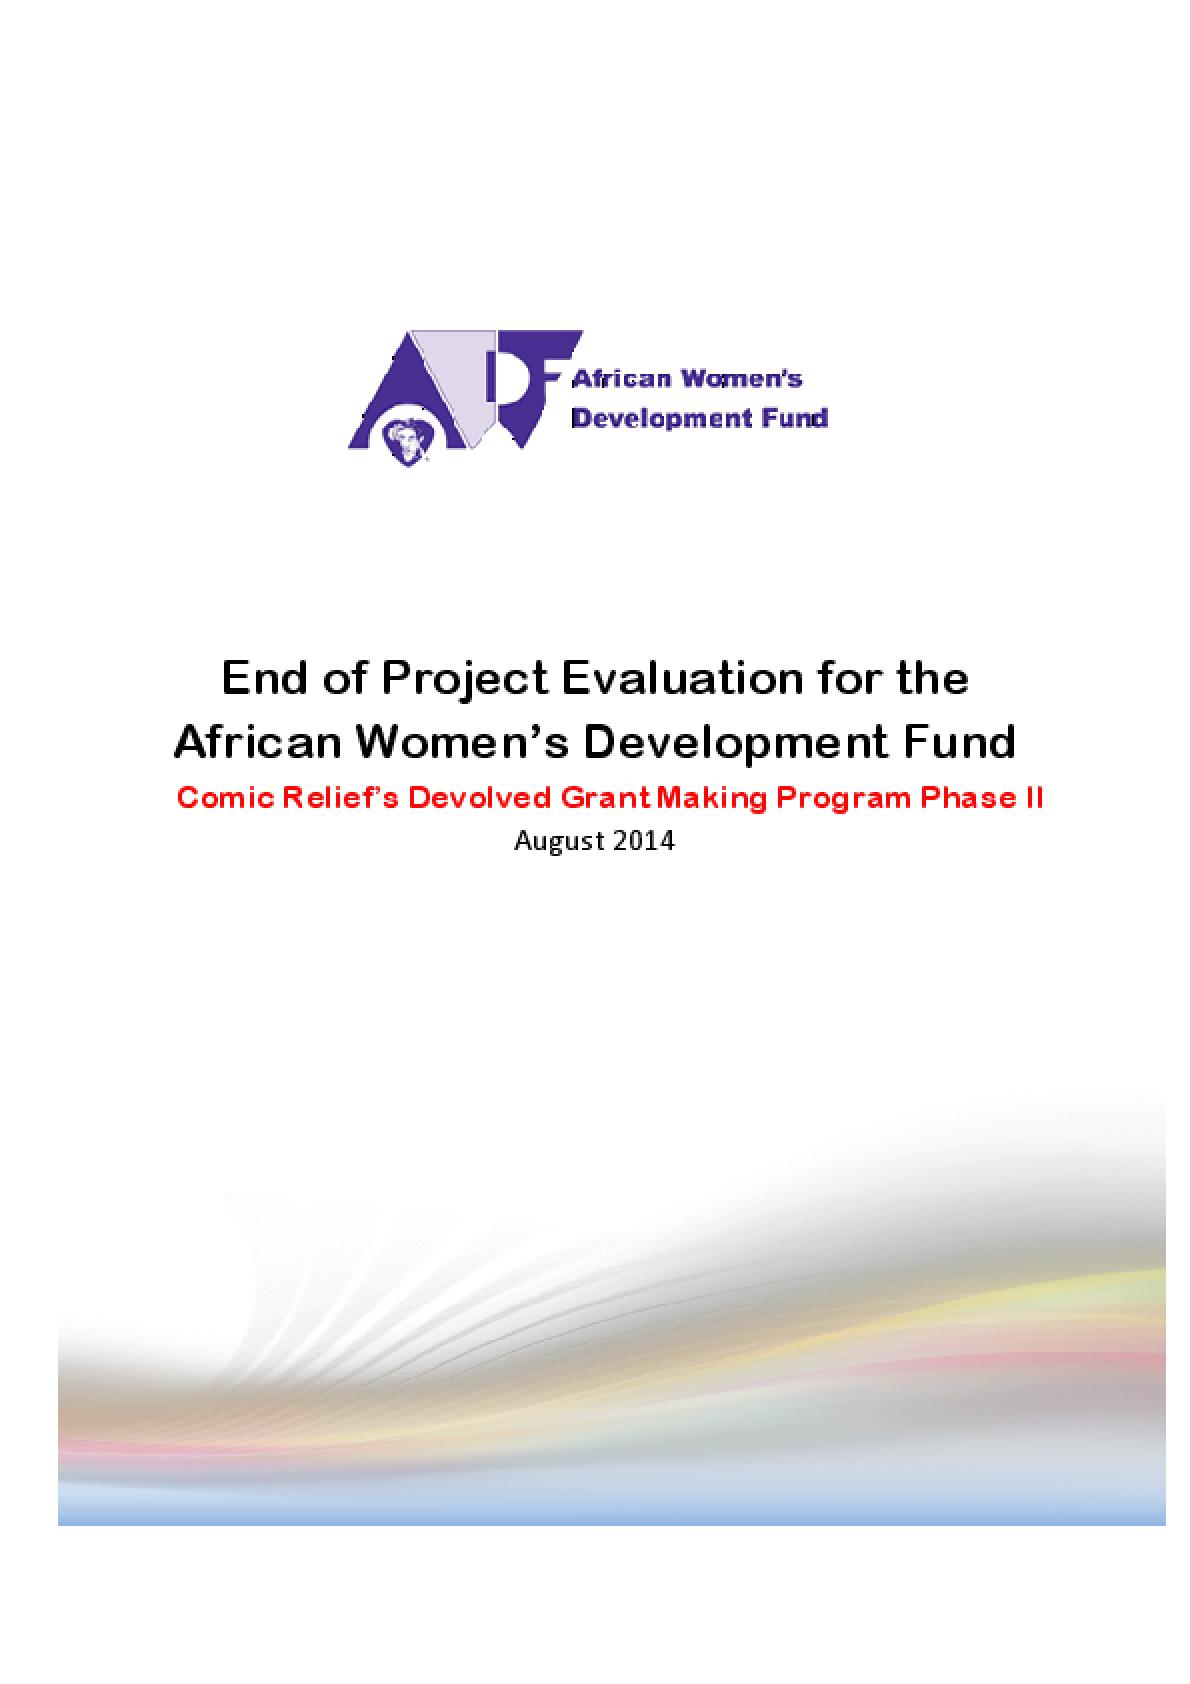 application for capability development grant